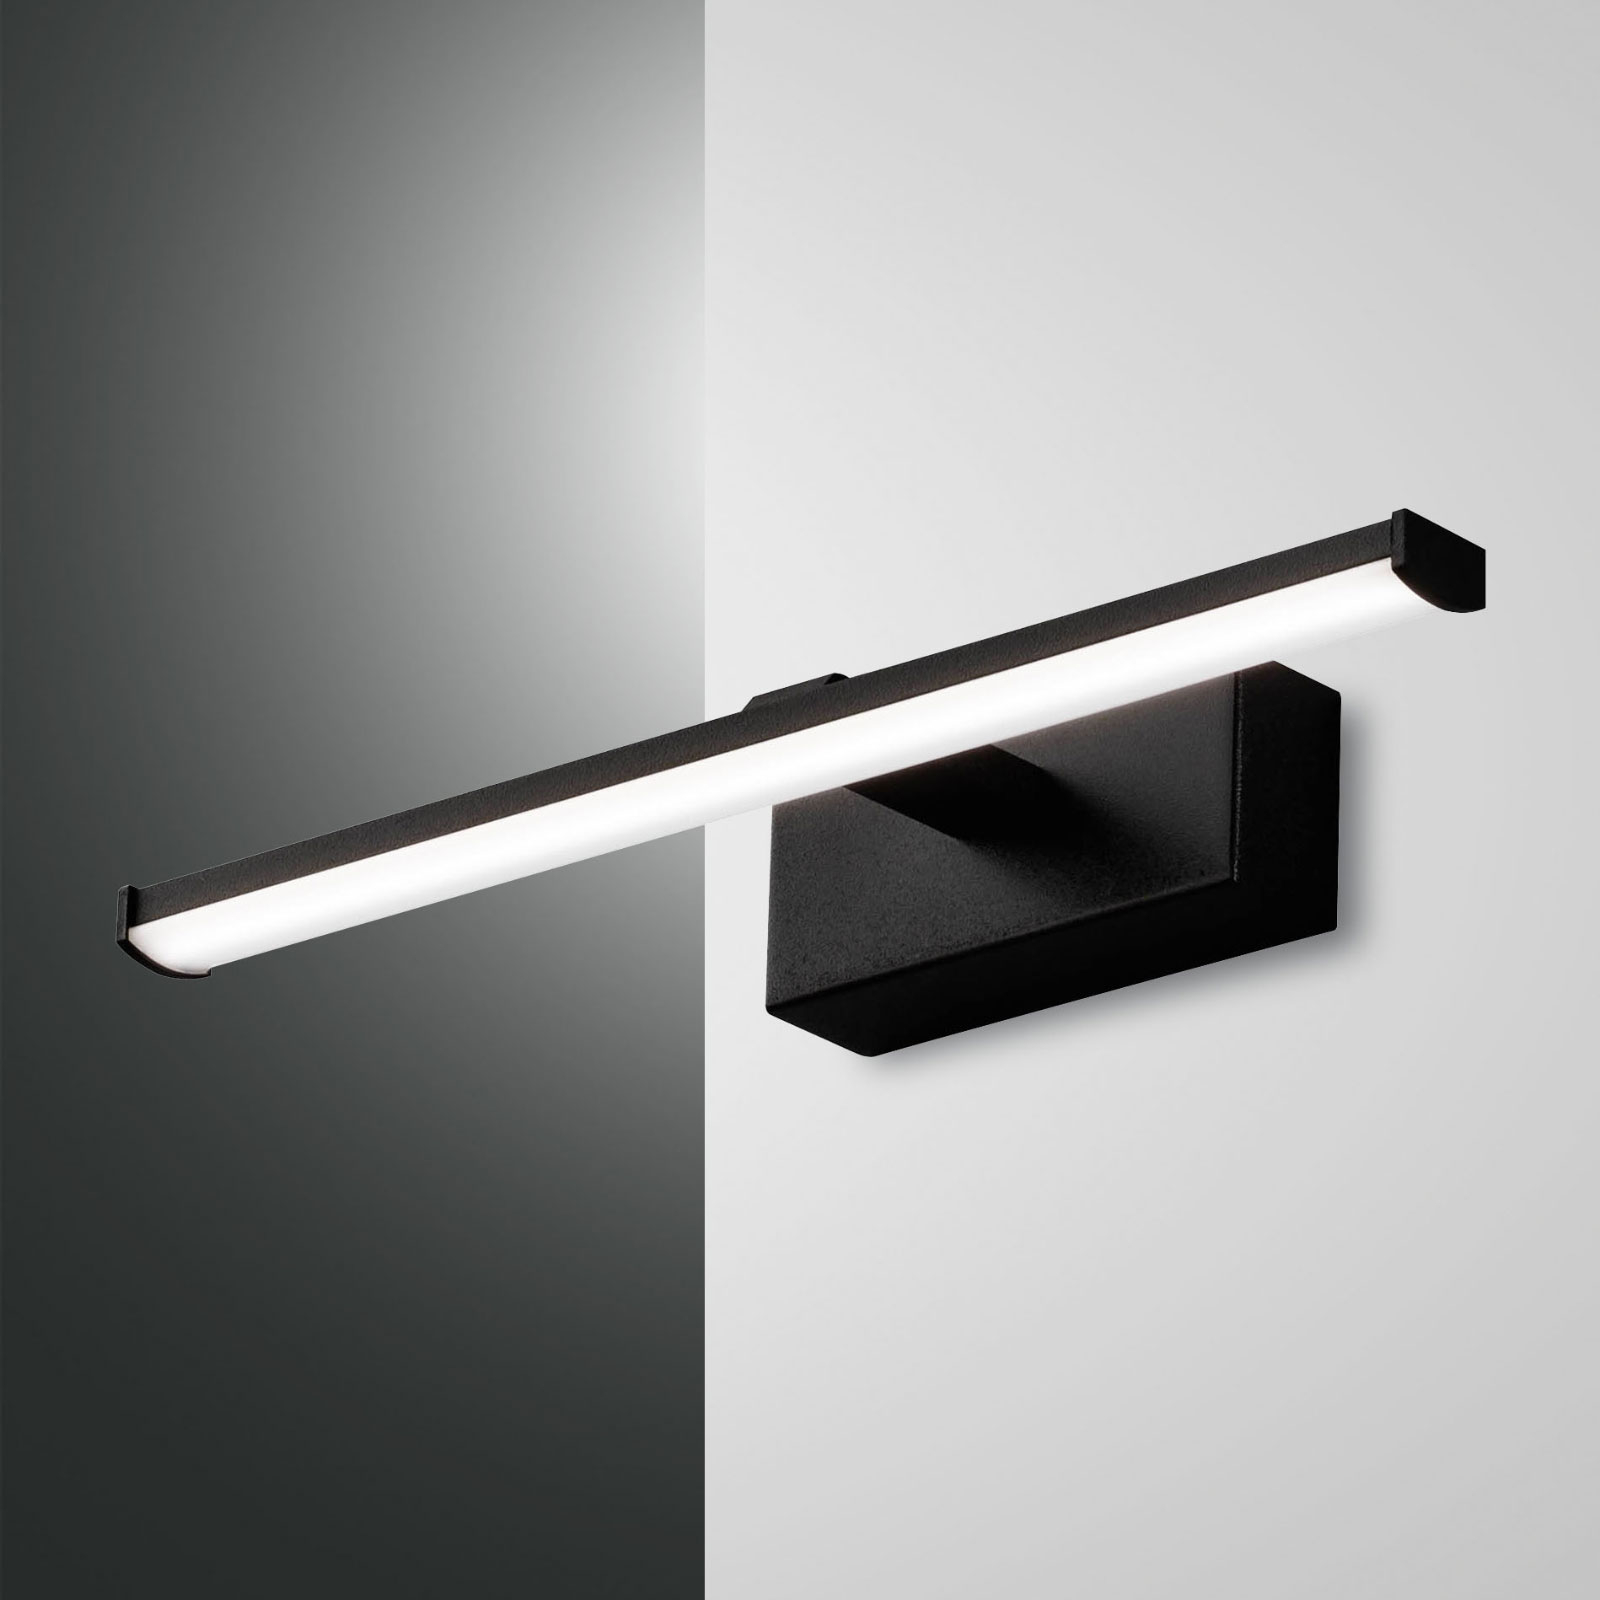 LED-vägglampa Nala, svart, bredd 30 cm